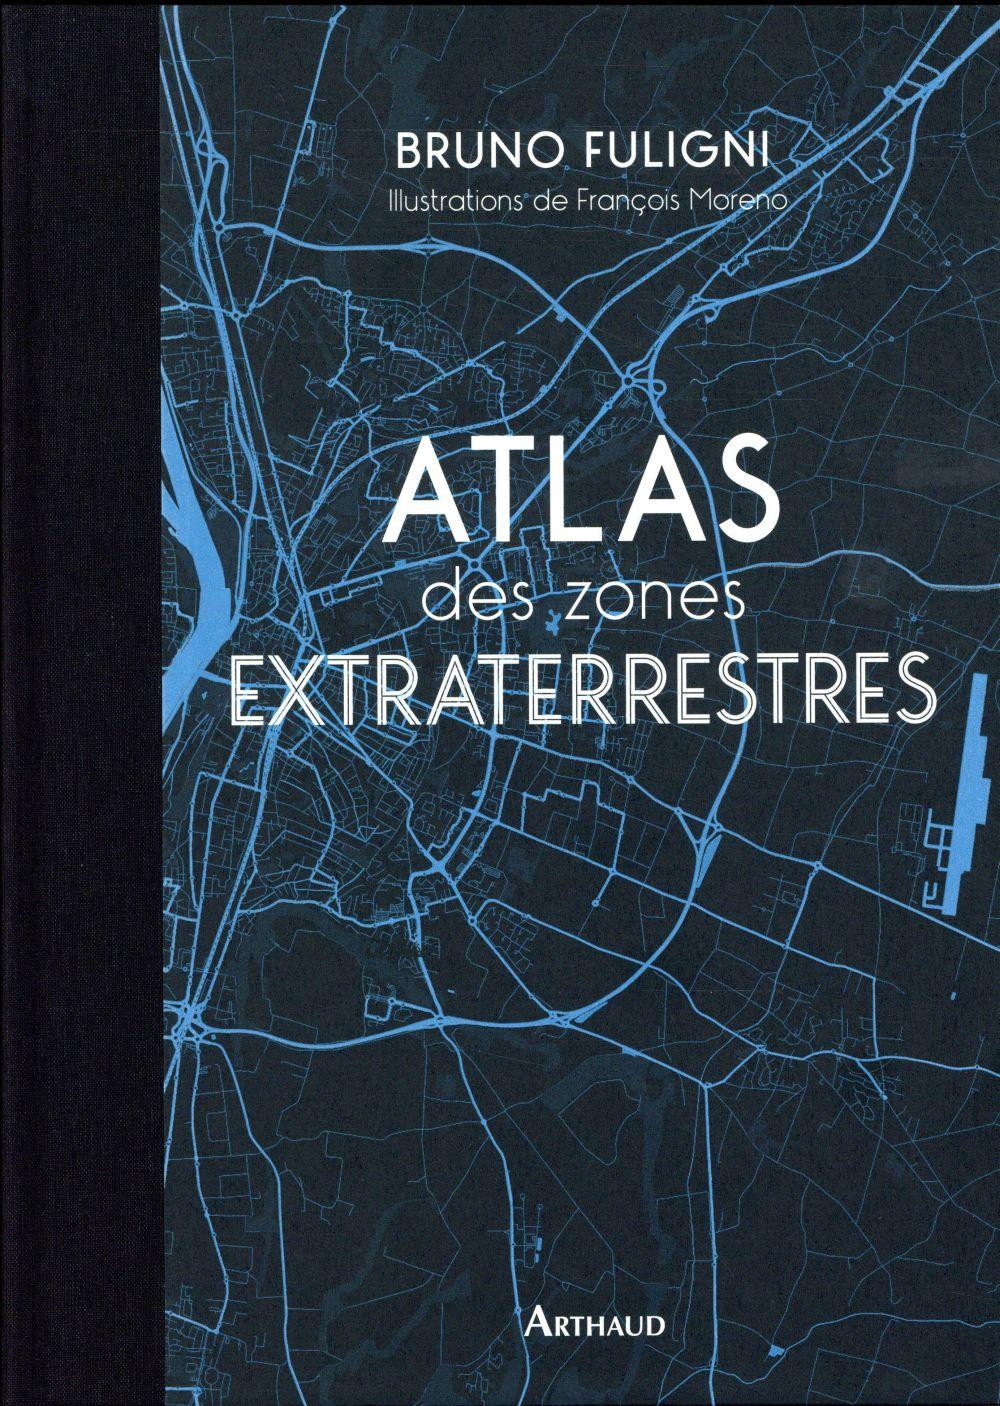 ATLAS DES ZONES EXTRATERRESTRES FULIGNI/MORENO FLAMMARION